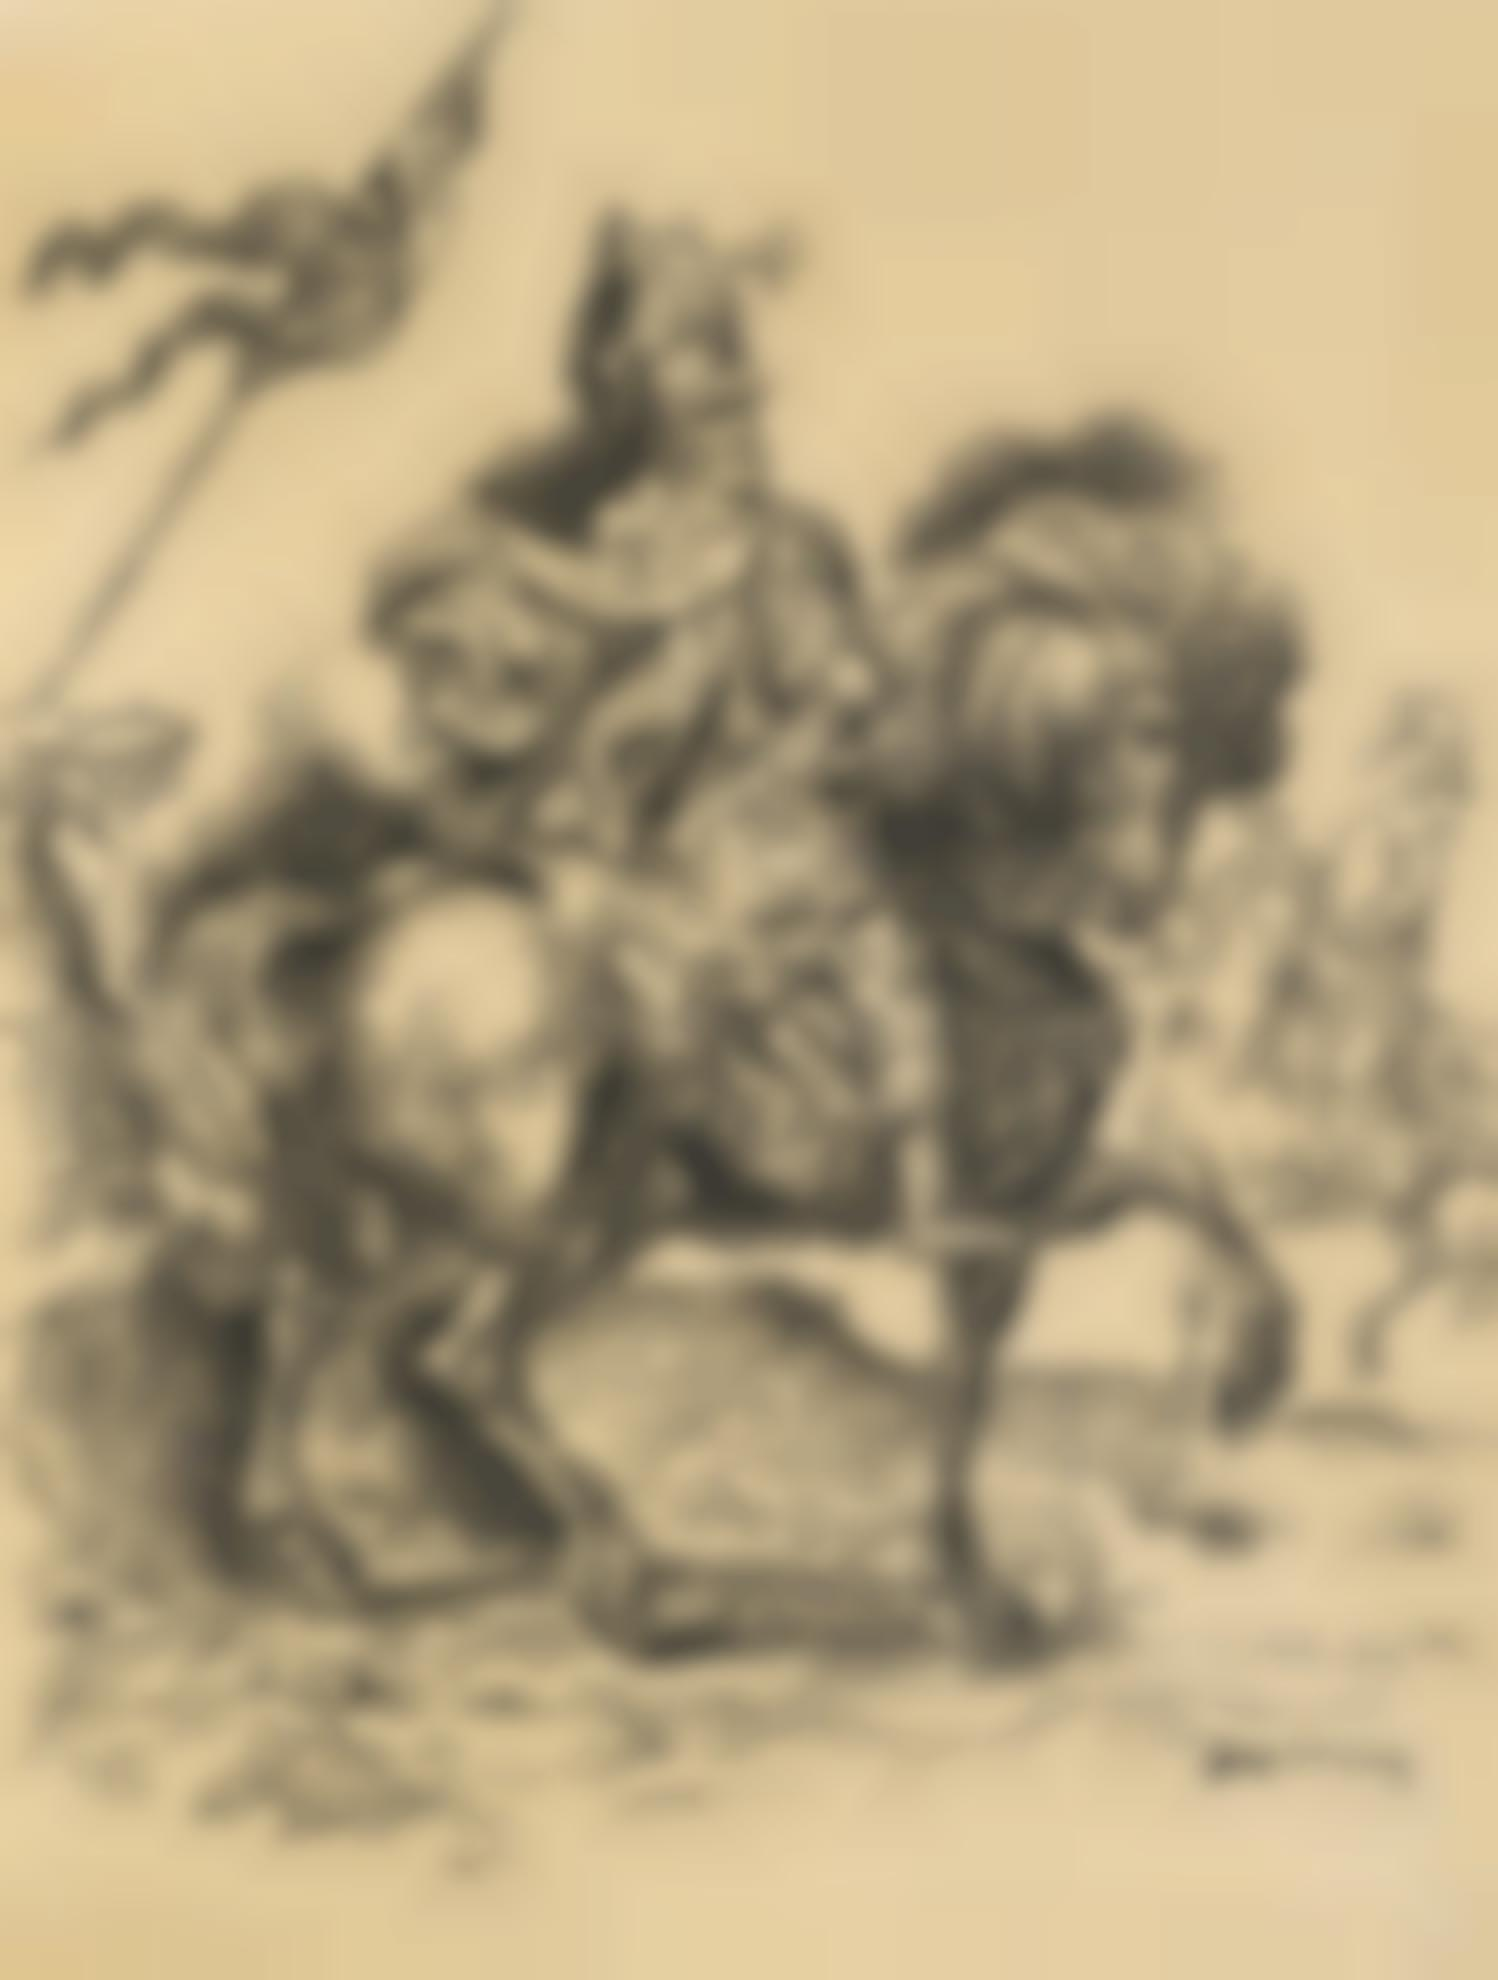 Giorgio de Chirico-Cavaliere Da Durer (Horse Rider From Durer)-1950